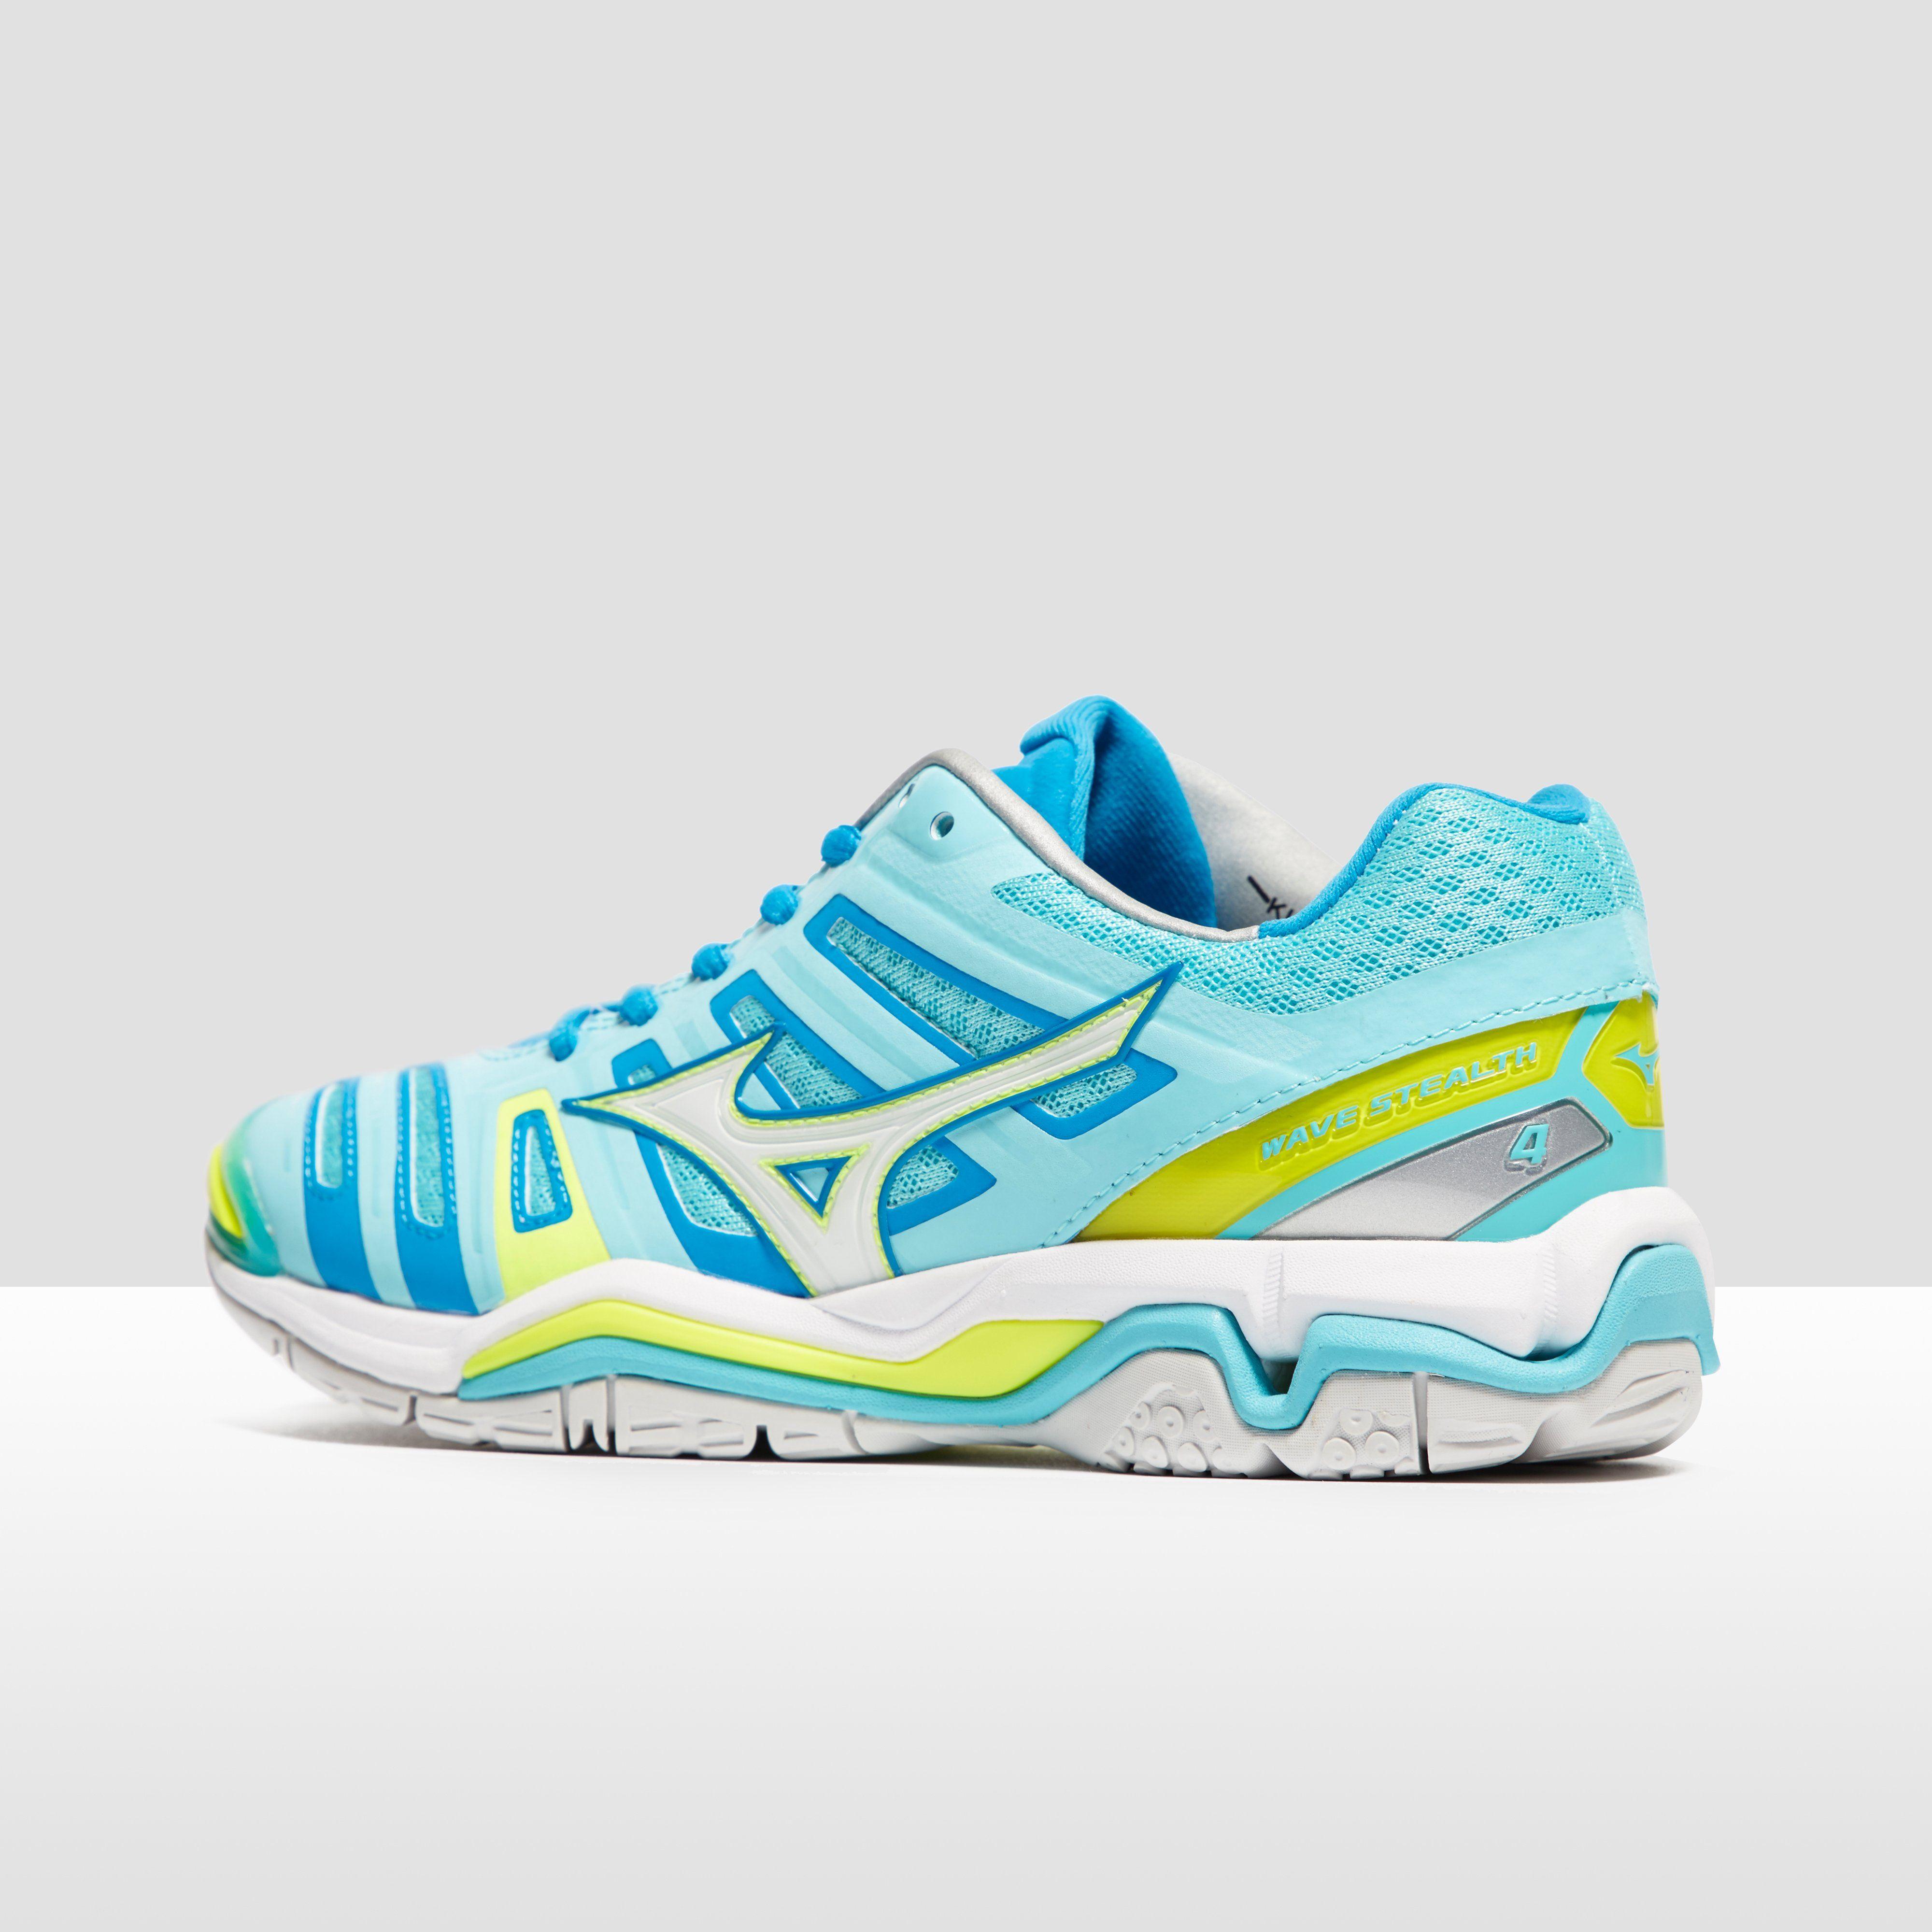 Mizuno Wave Stealth 4 Women's Running Shoes